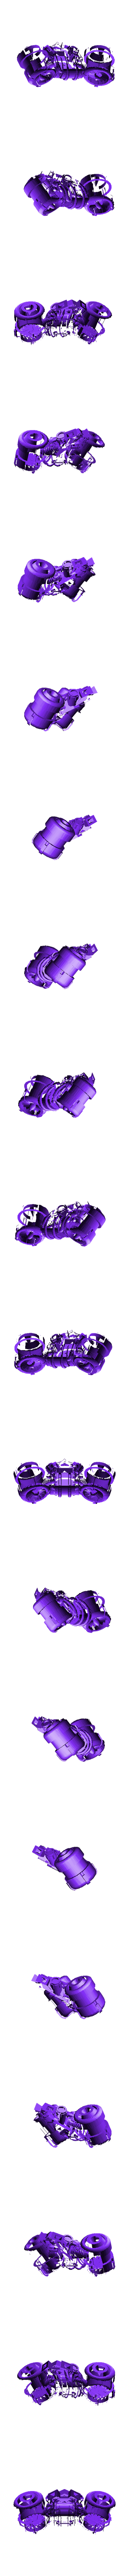 Marine_6_Jet_Pack.stl Download free STL file Assault Marine Builder Berserker, Tzaangors, Blade Cabal • 3D printable template, Mazer